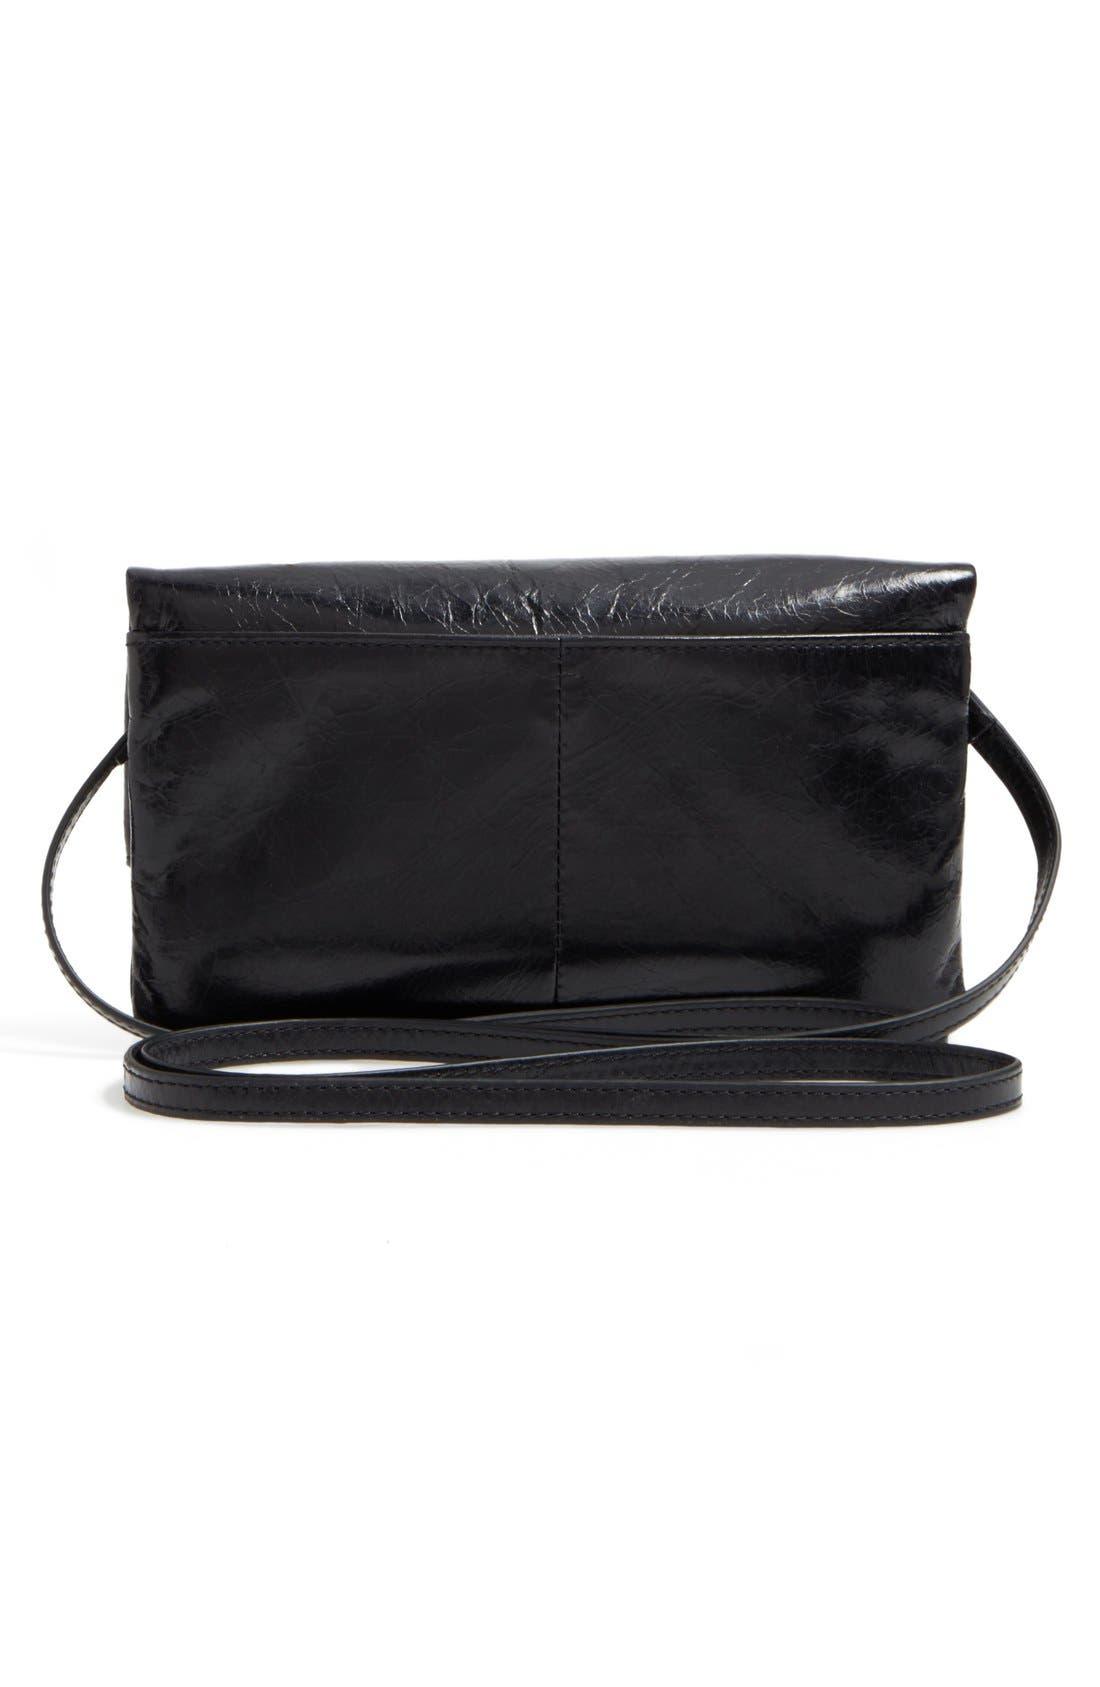 Rudy Leather Crossbody Bag,                             Alternate thumbnail 7, color,                             001